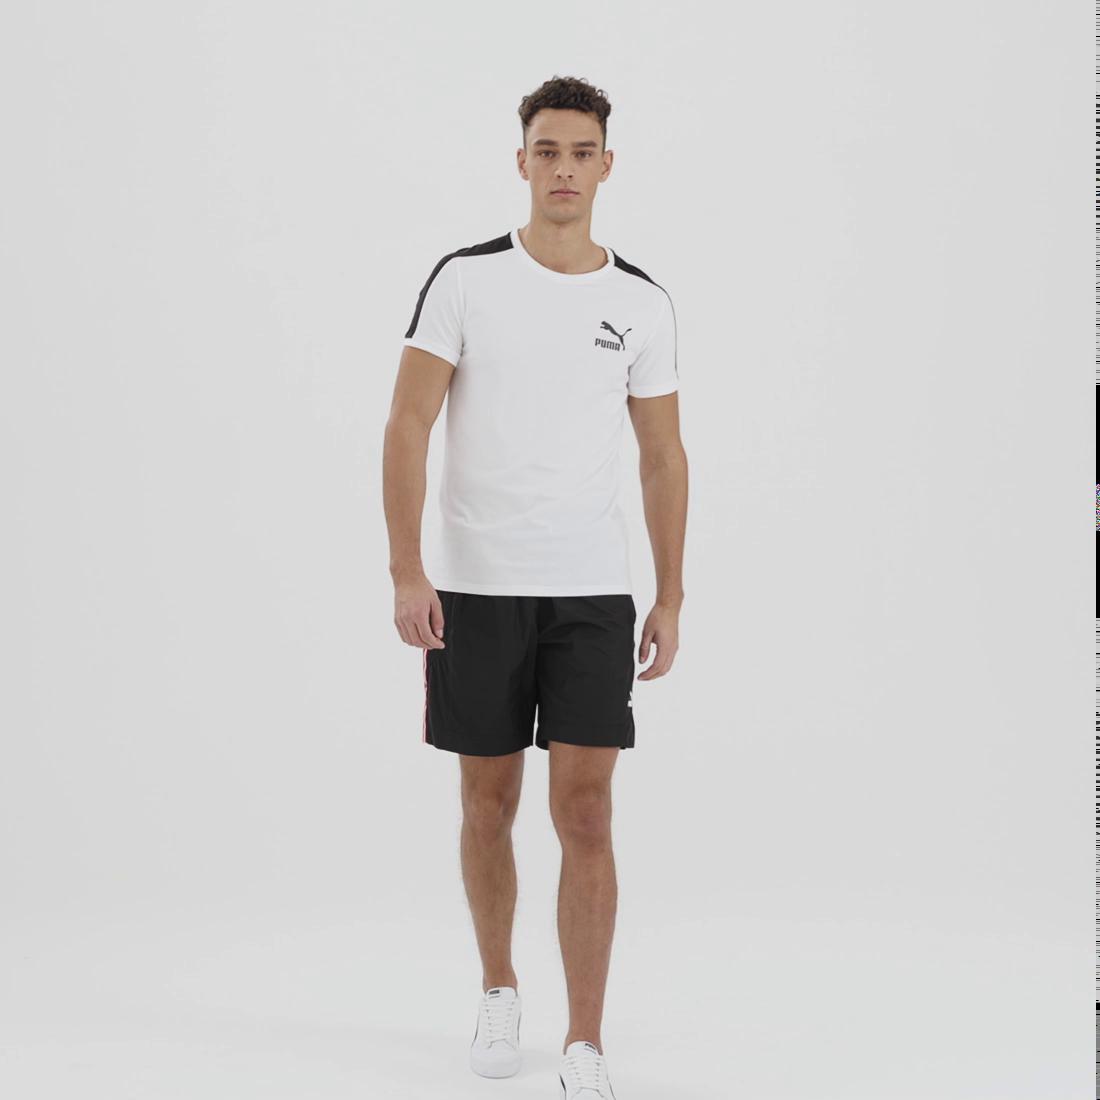 Imagen PUMA Shorts PUMA Tailored for Sport Woven para hombre #6